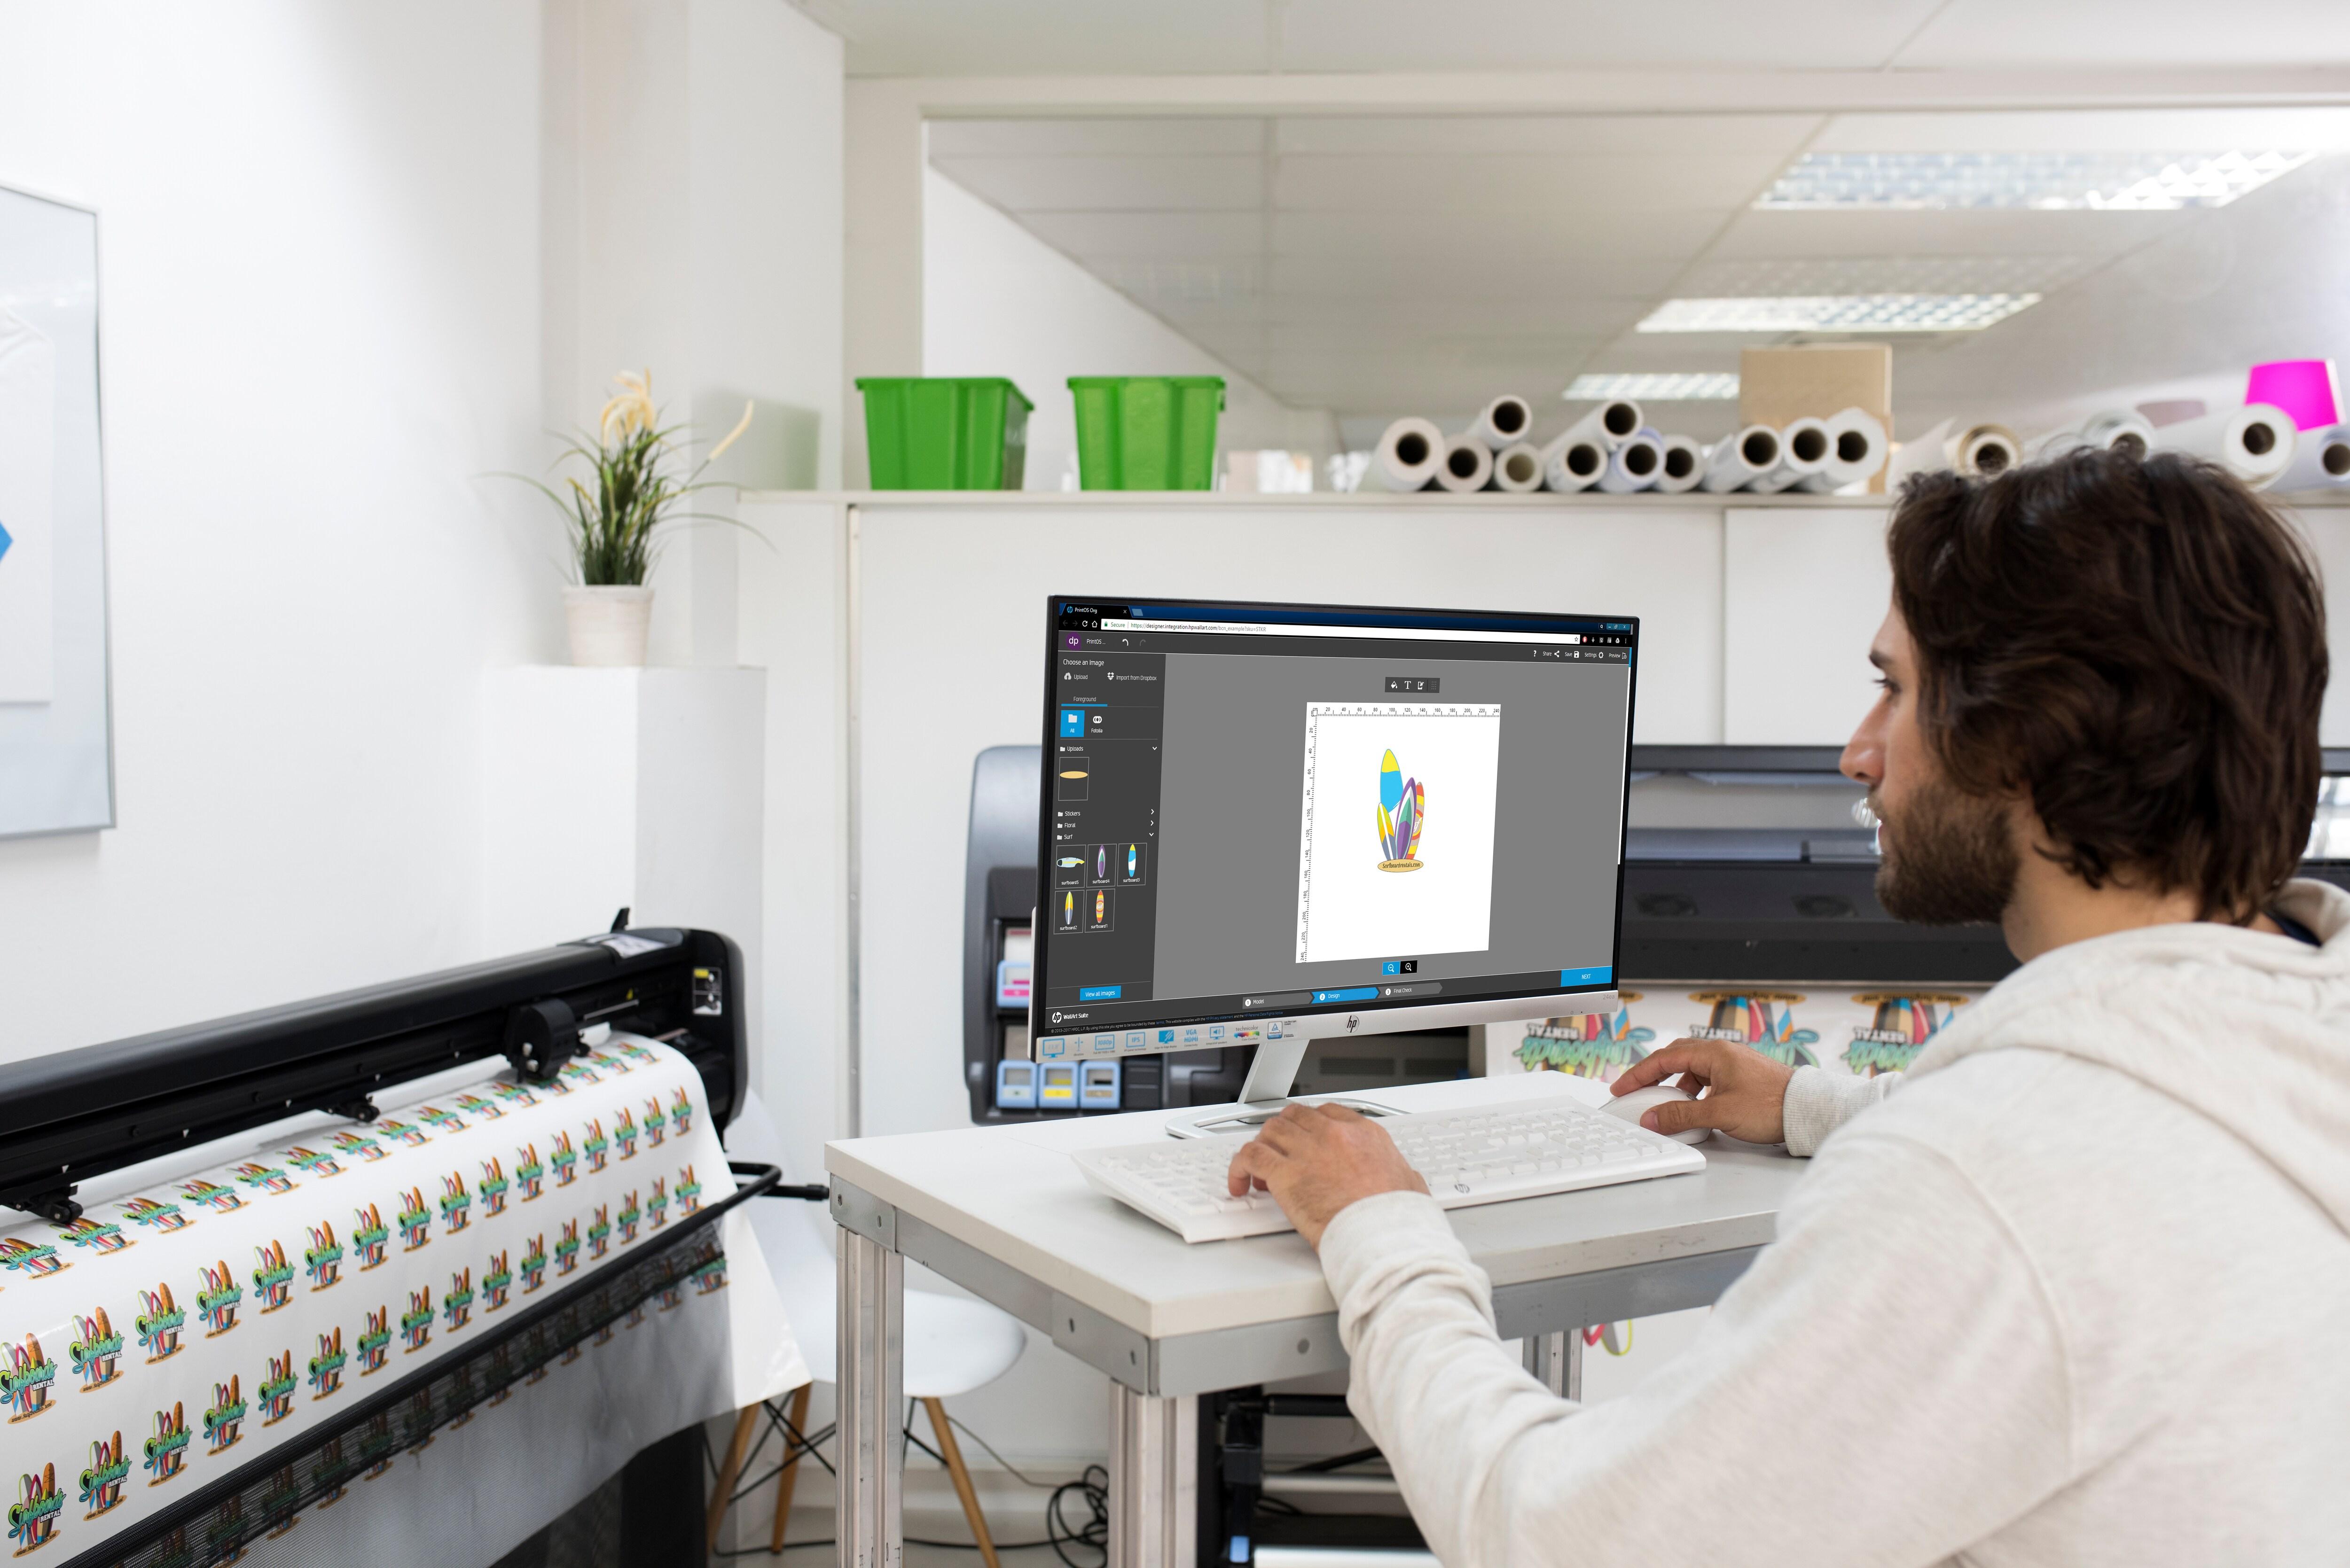 Программно-аппаратный комплекс для широкоформатной печати и плоттерной резкиHP Latex 335 Print and Cut Solution - фото 6